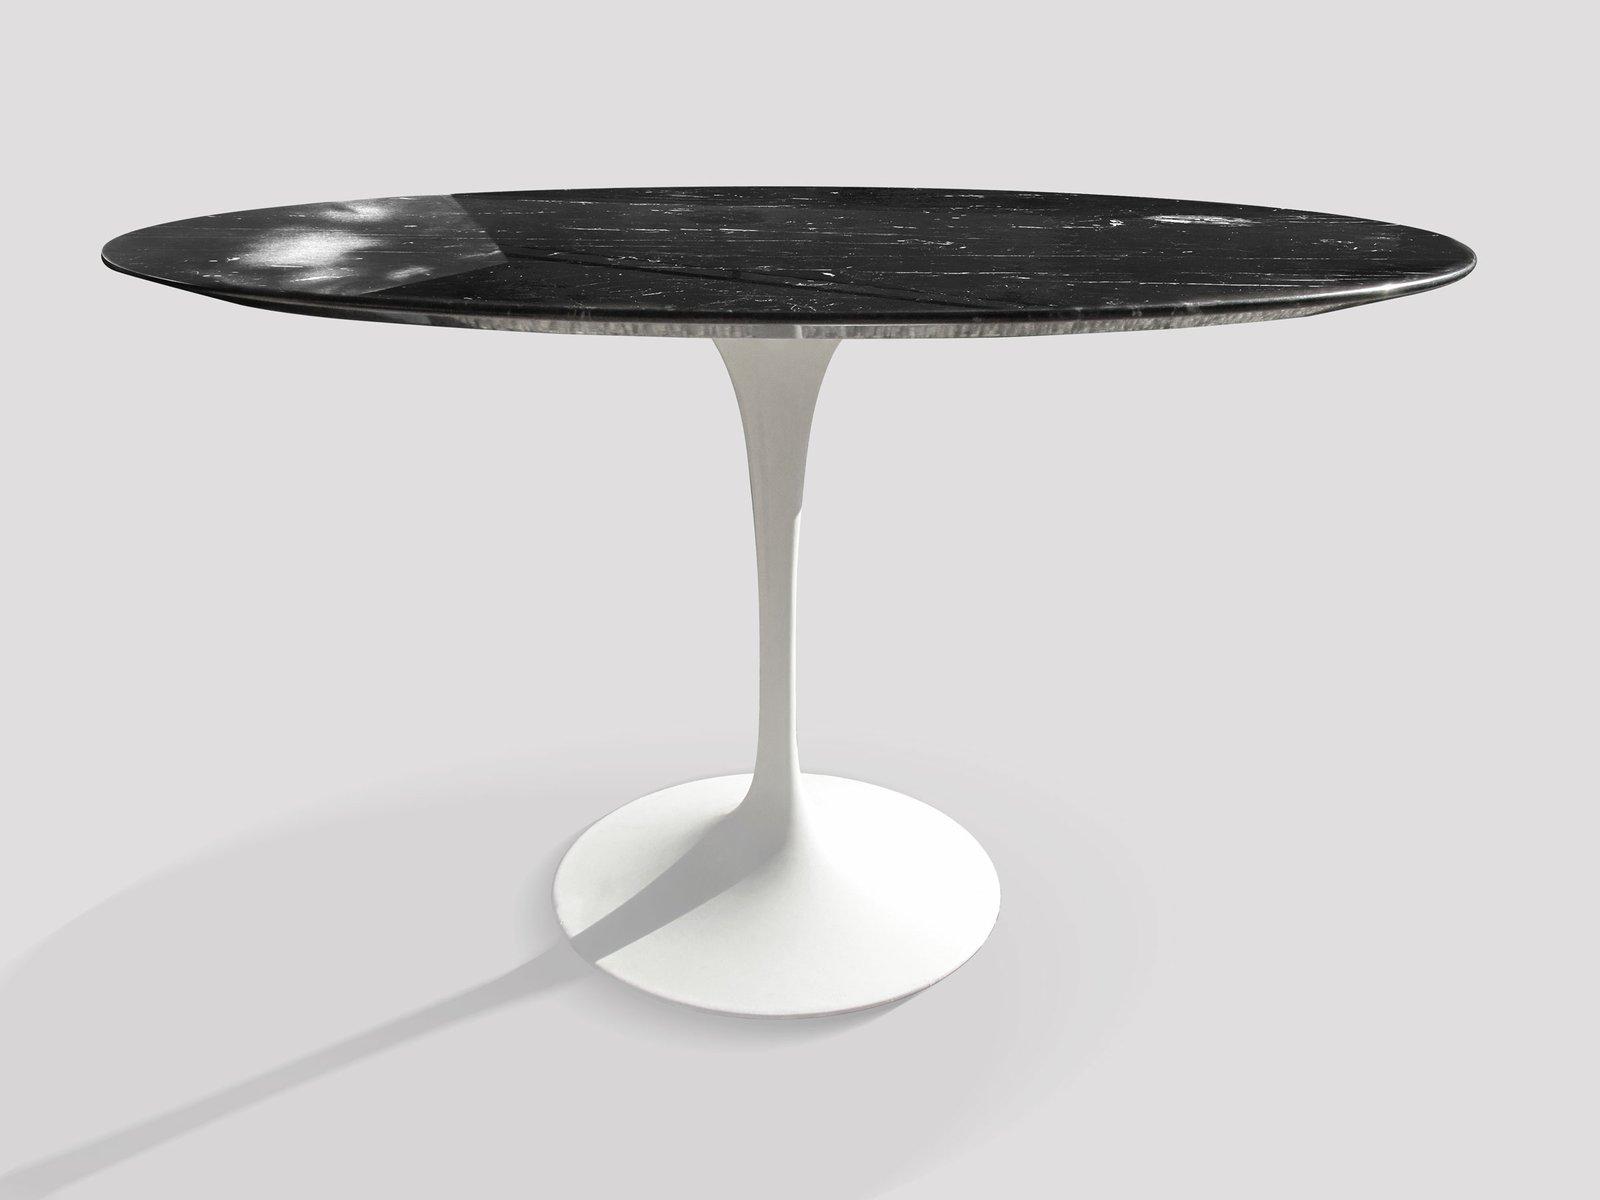 Tavolo da pranzo vintage in marmo nero marquinia di eero saarinen per knoll in vendita su pamono - Tavolo saarinen knoll originale ...